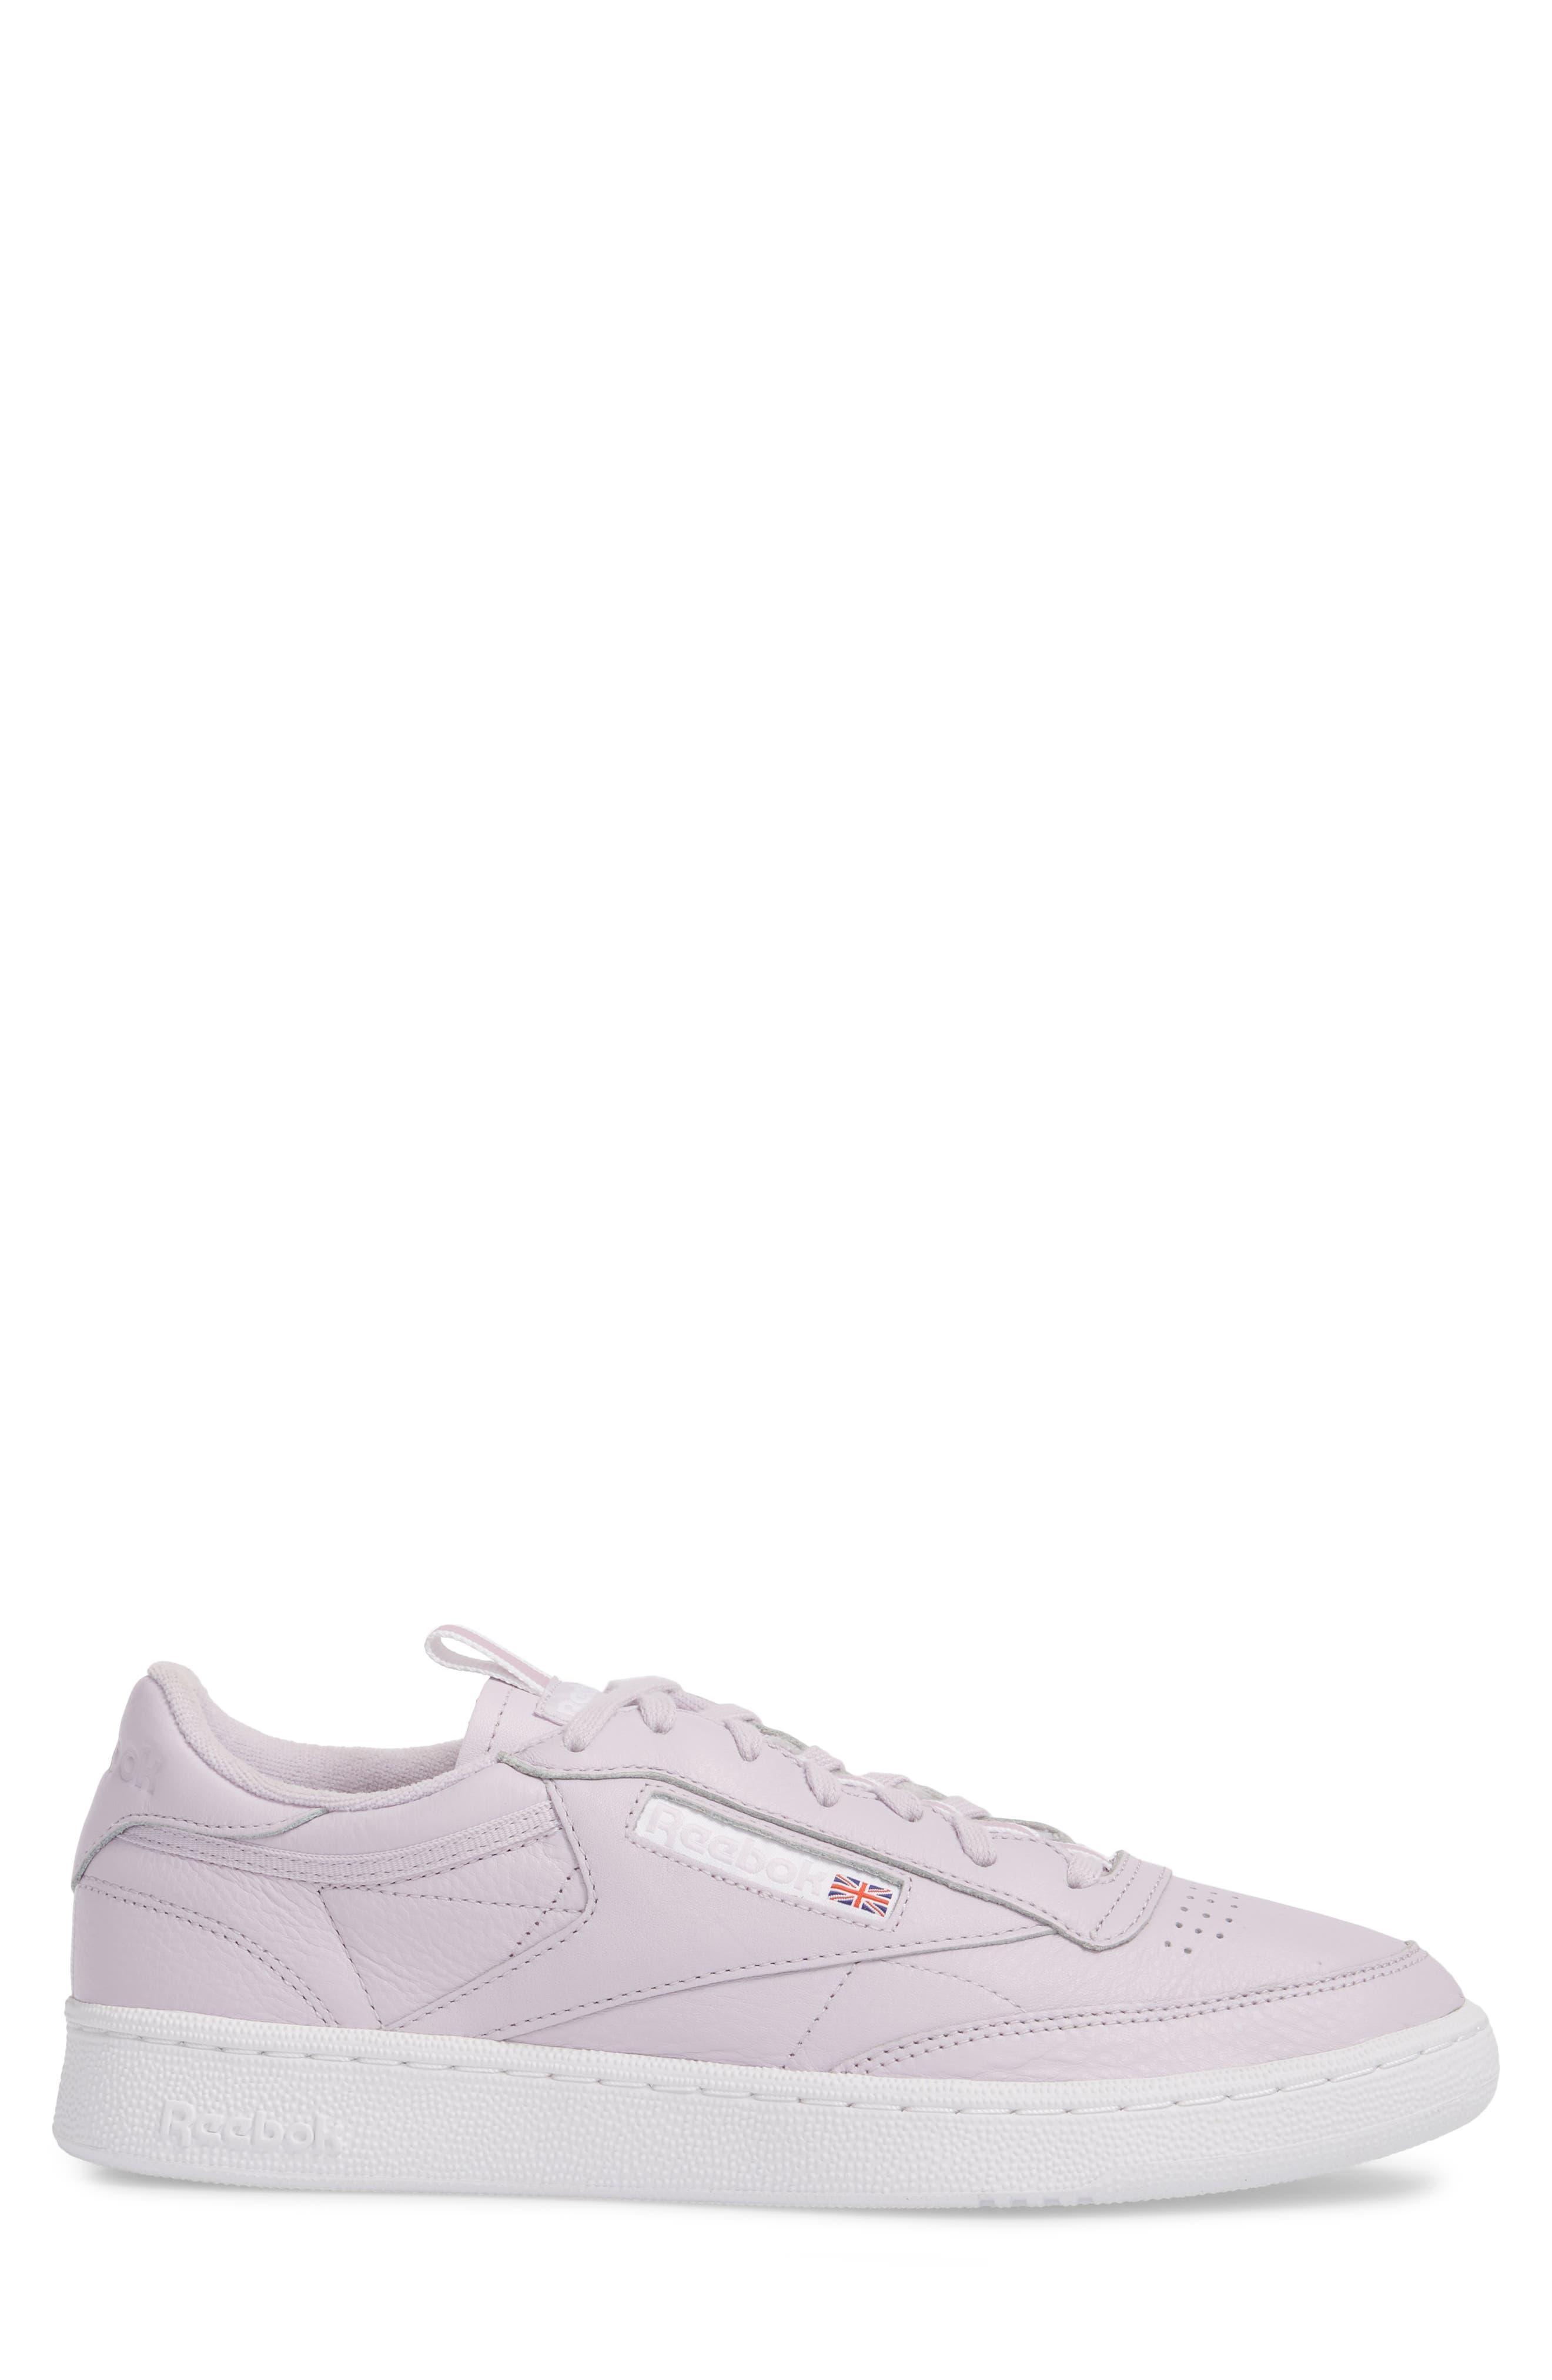 Club C 85 RT Sneaker,                             Alternate thumbnail 3, color,